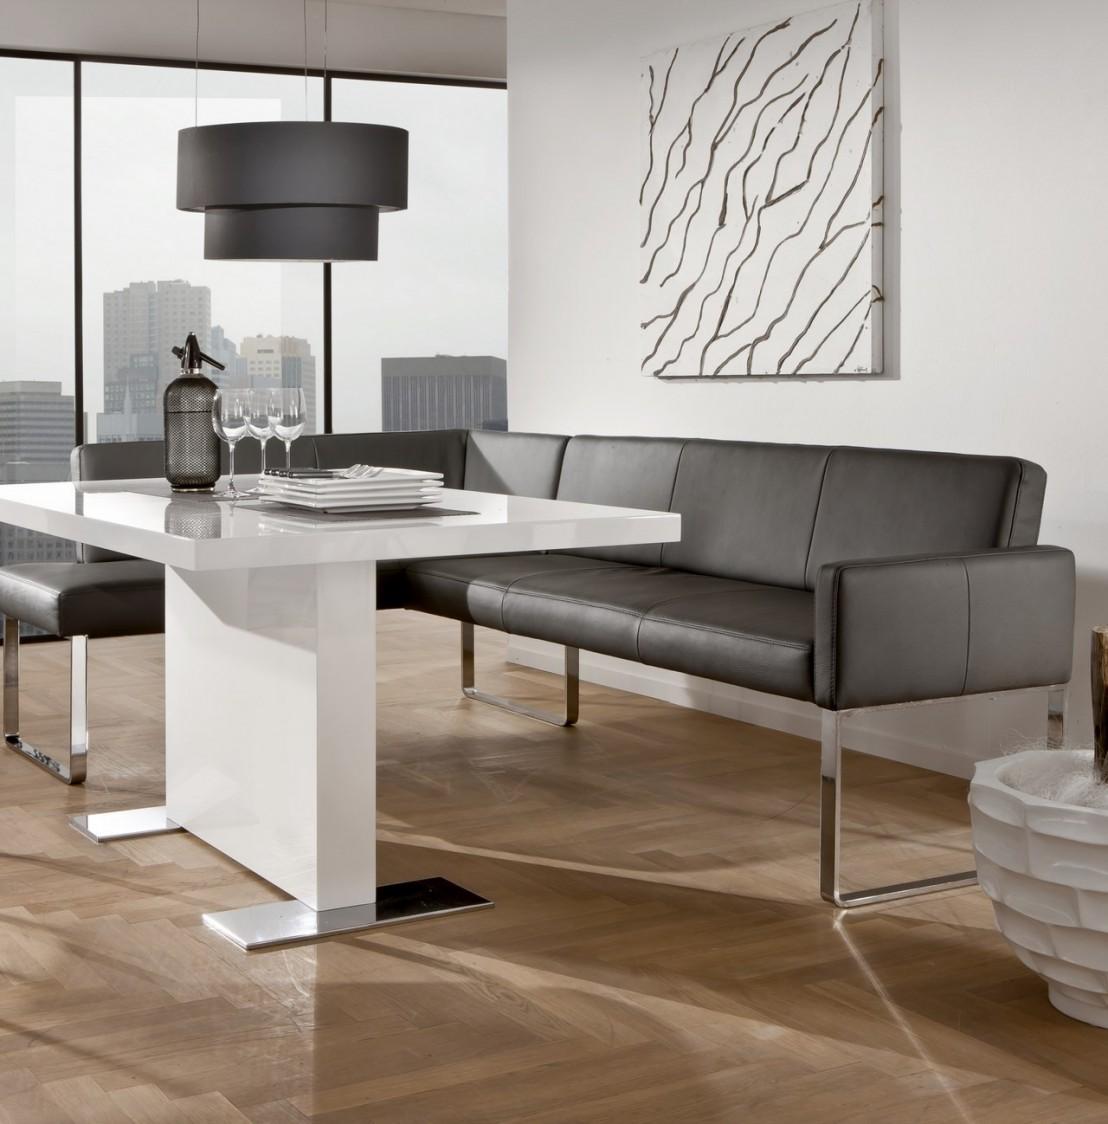 petite banquette d 39 angle puredining design en cuir 130 x 169 cm. Black Bedroom Furniture Sets. Home Design Ideas